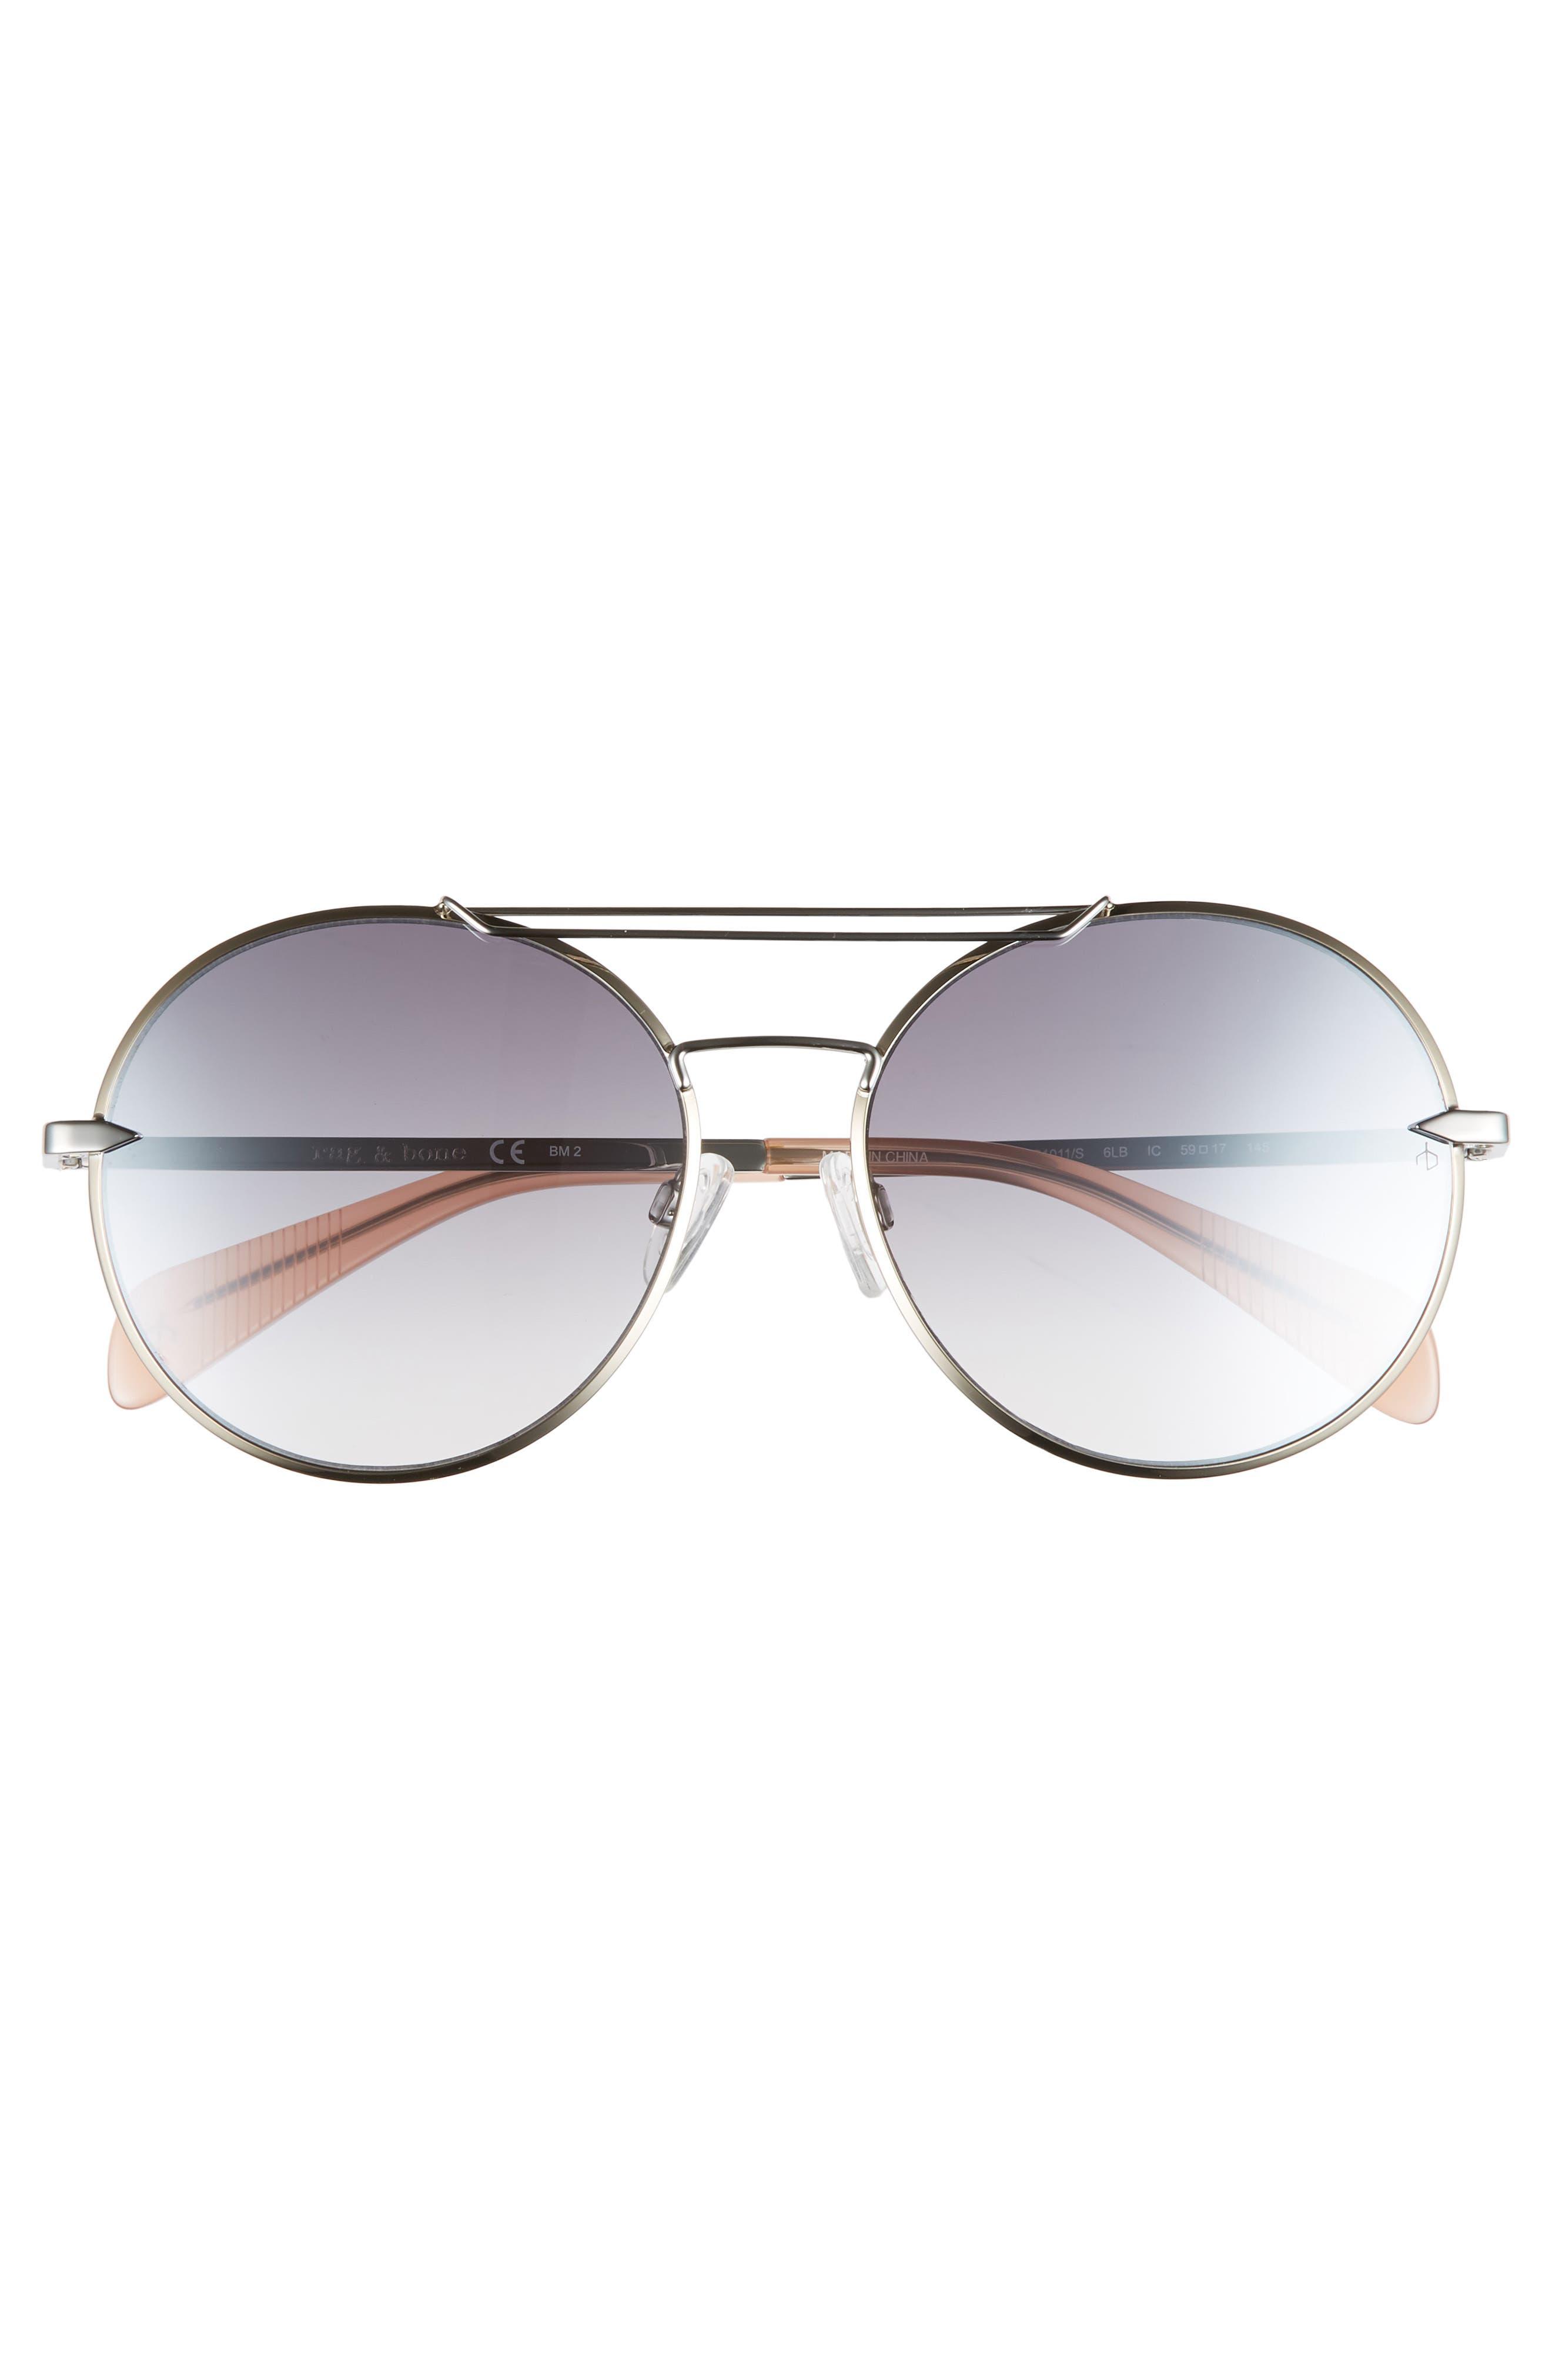 59mm Round Metal Aviator Sunglasses,                             Alternate thumbnail 3, color,                             RUTHENIUM